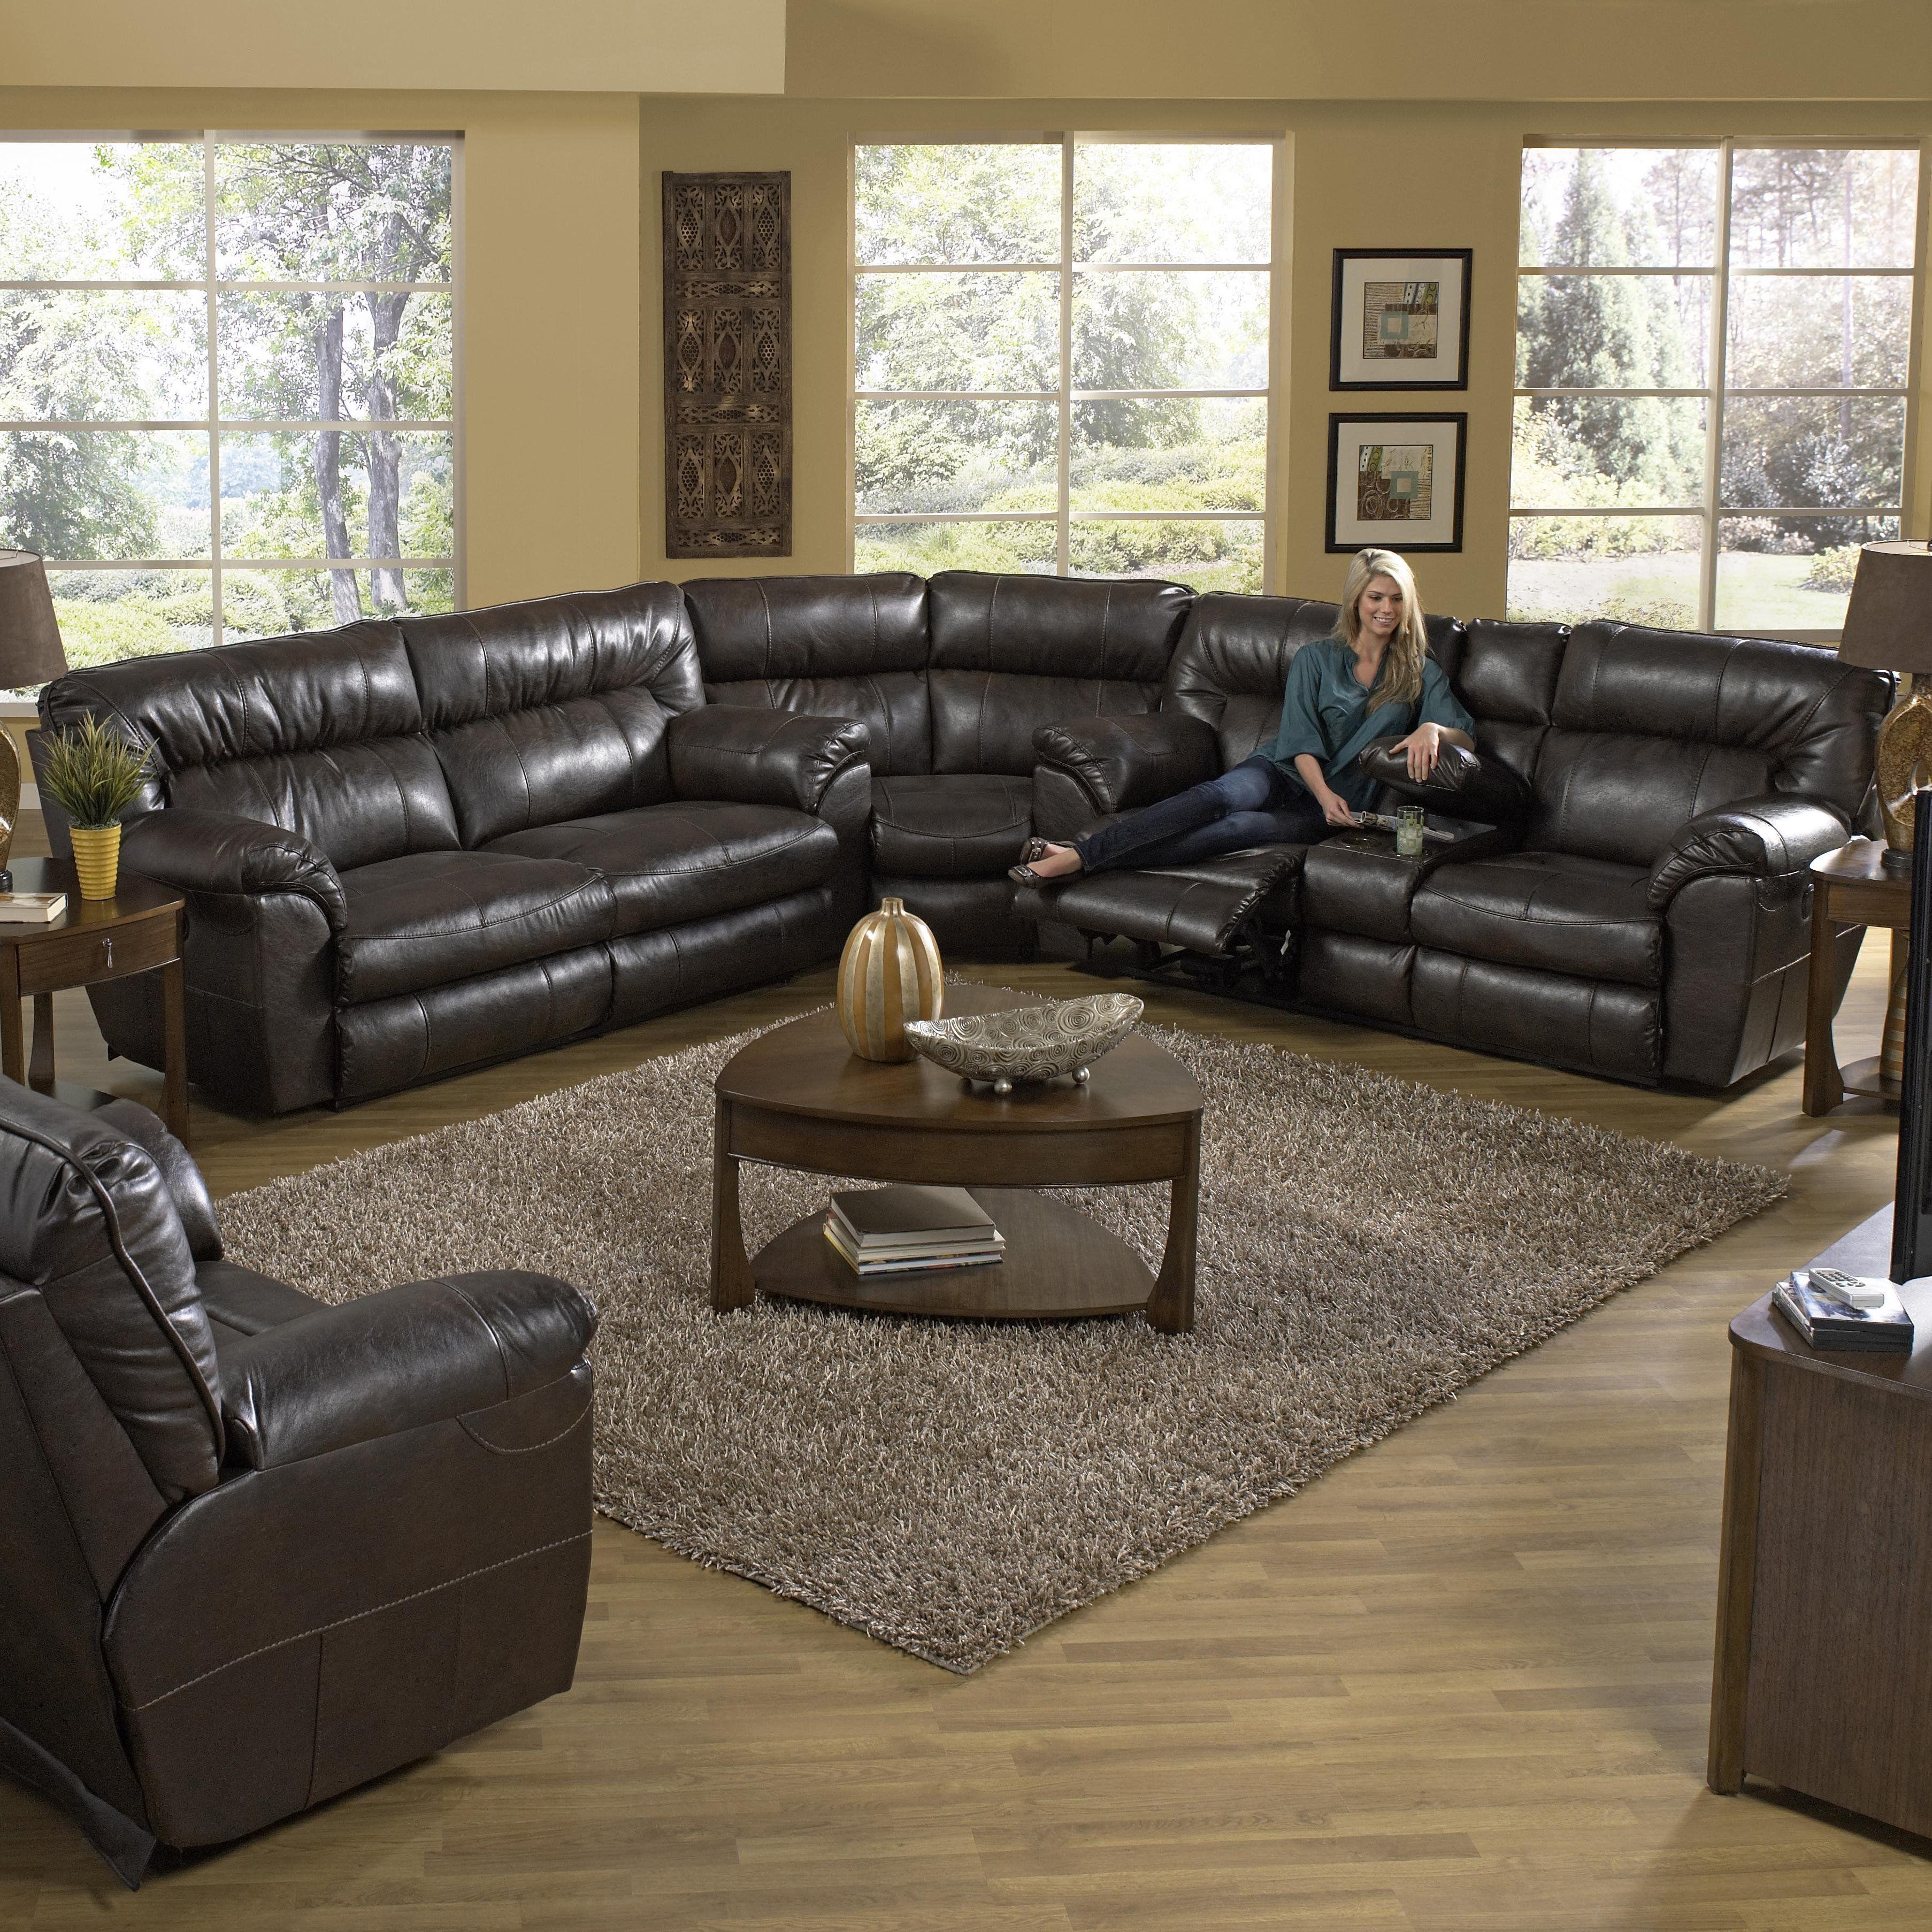 Catnapper nolan godiva sectional living room leather